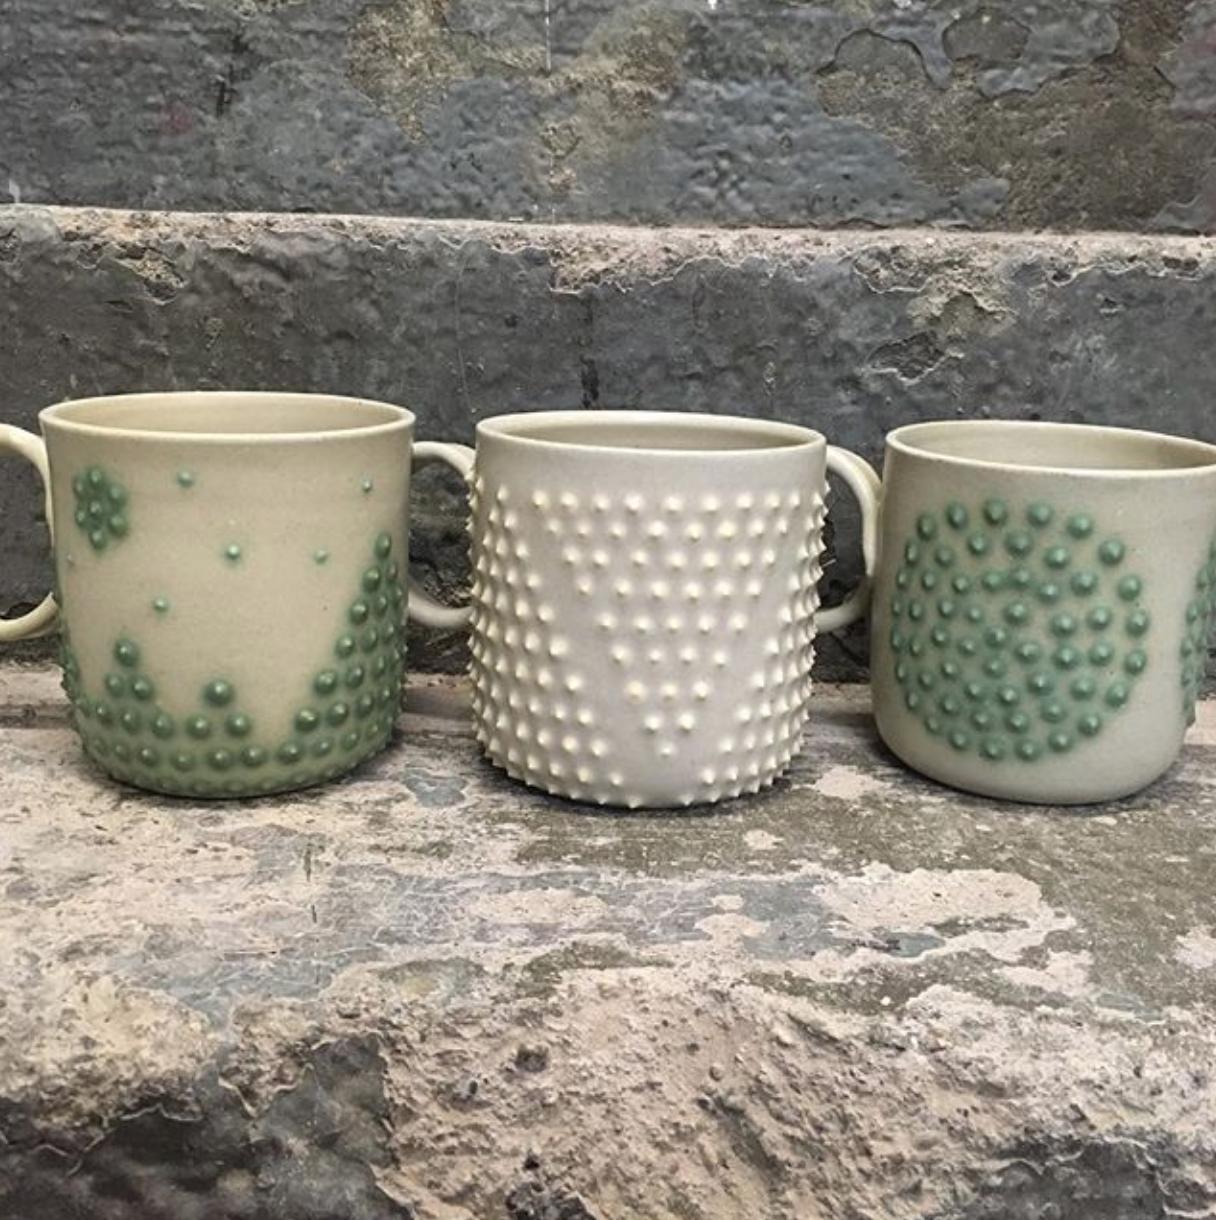 eldorado general store held ceramics